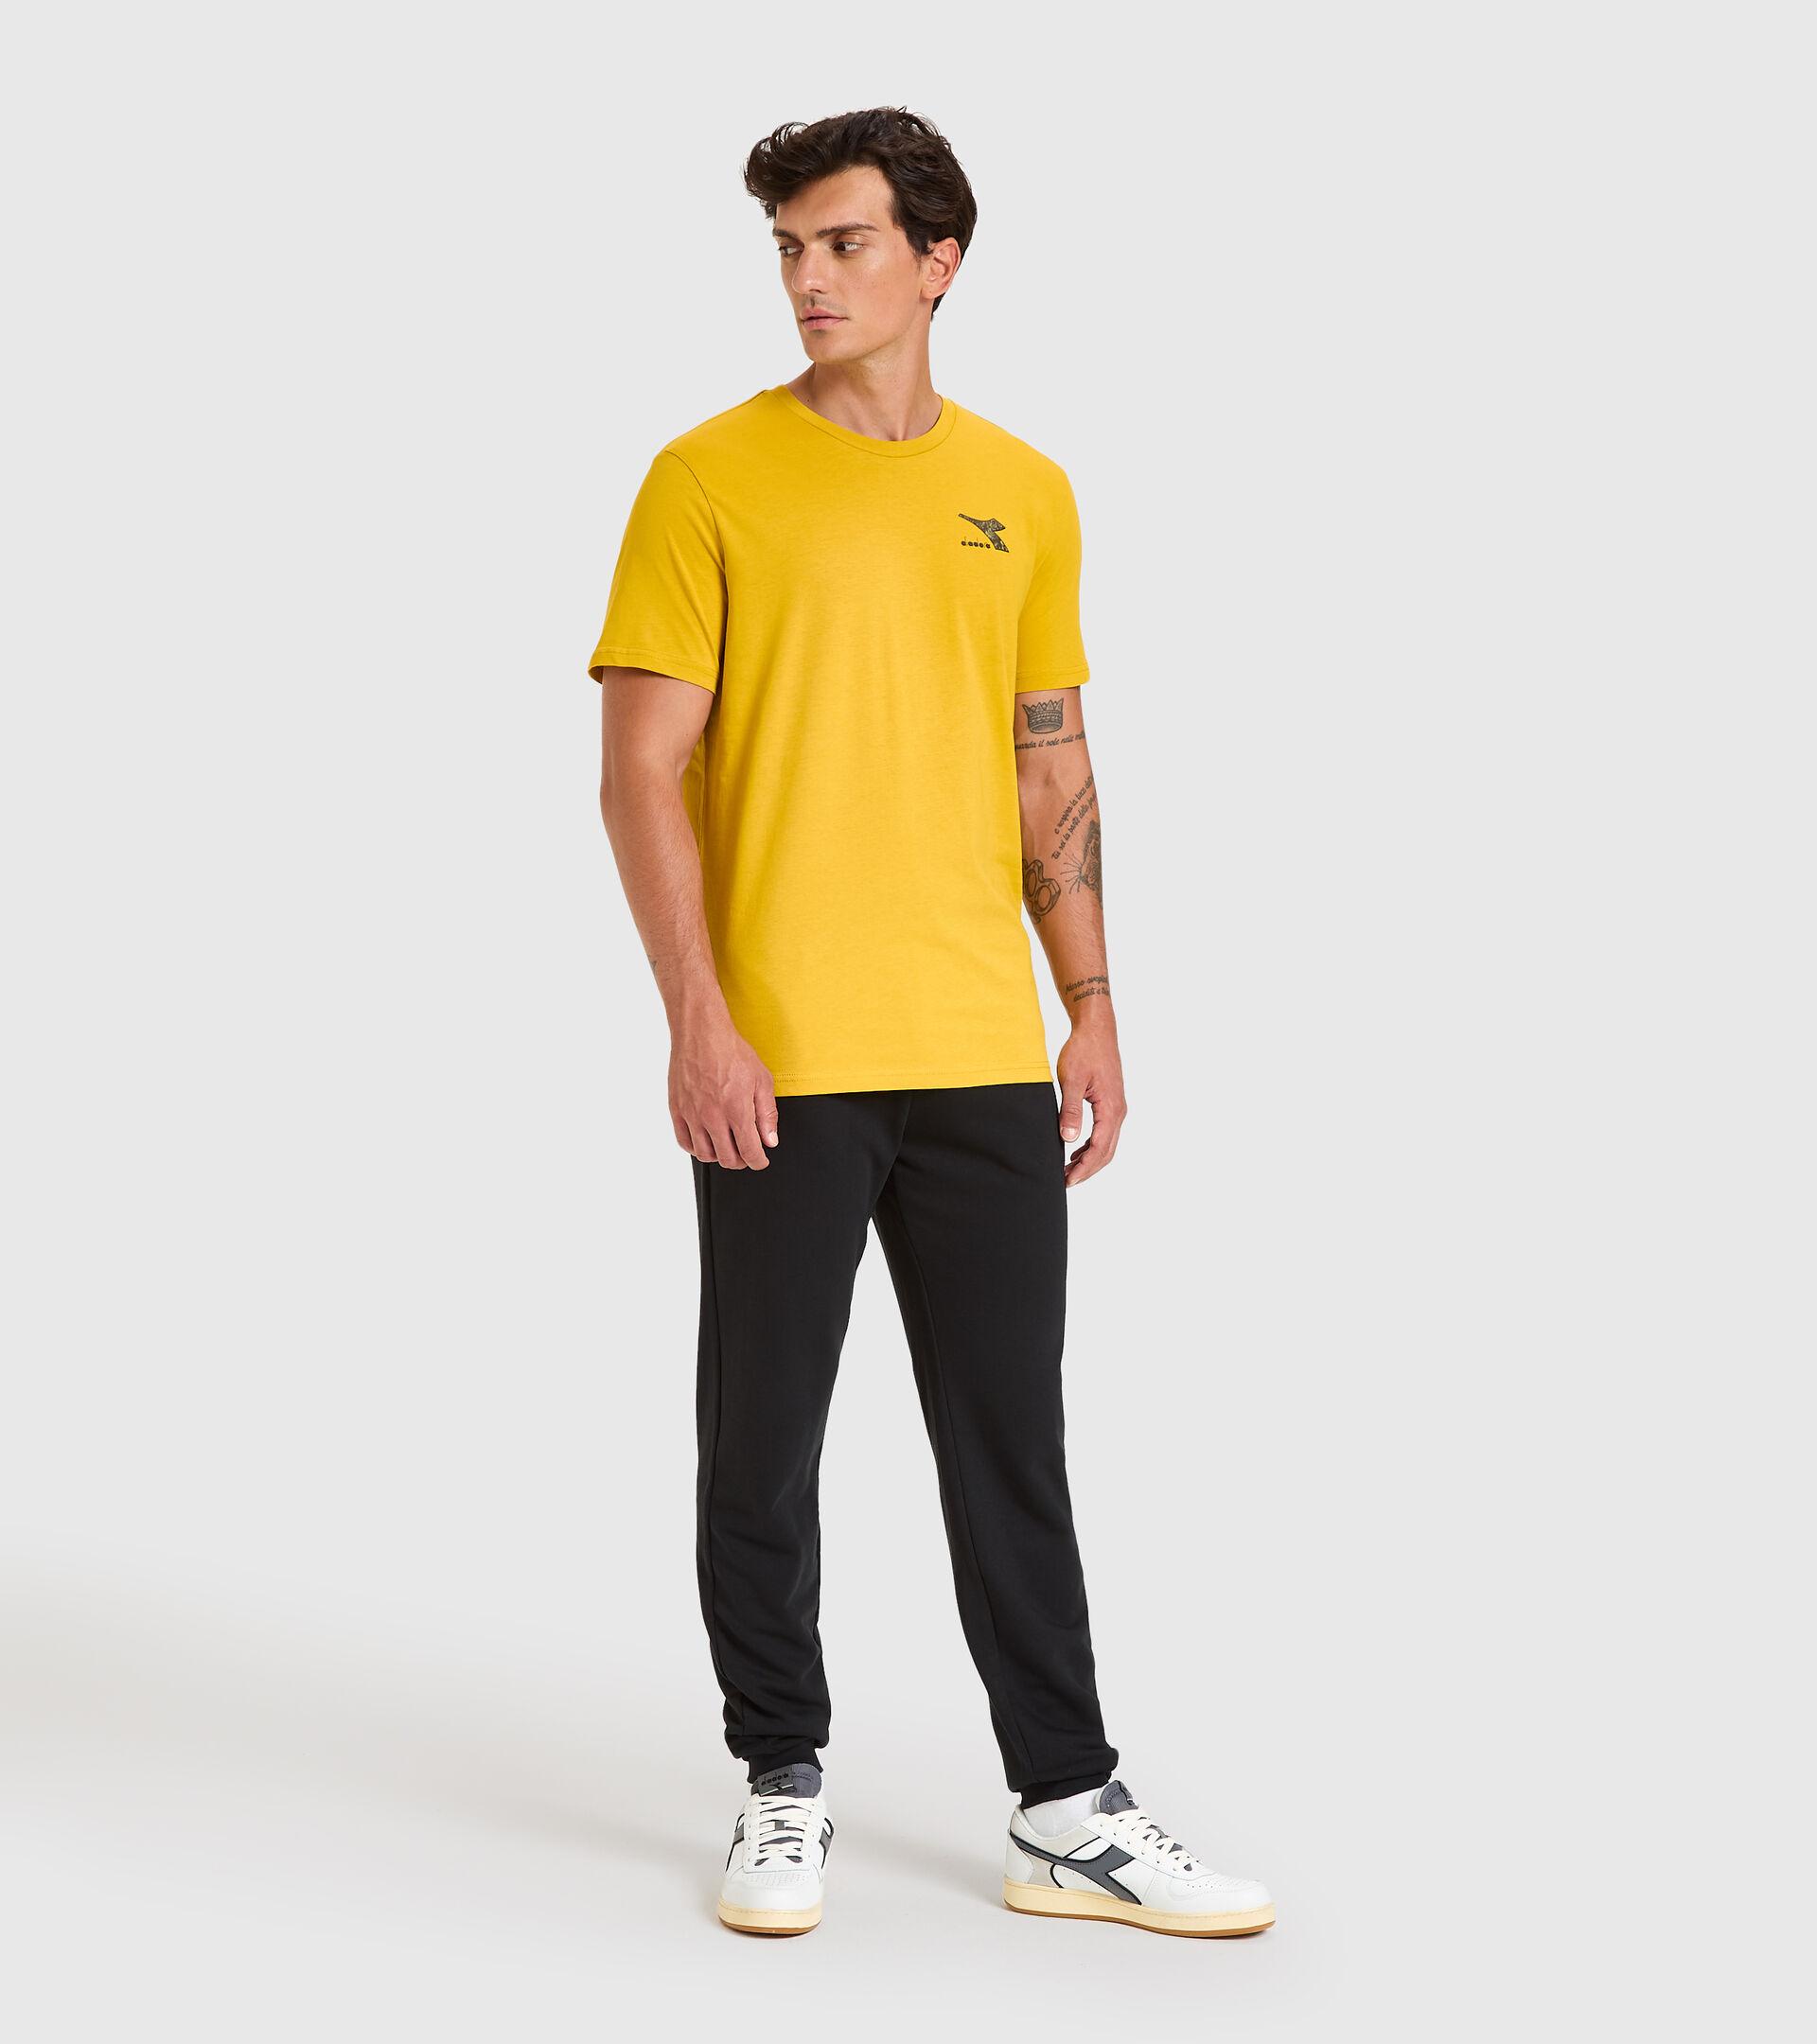 T-shirt - Men T-SHIRT SS CHROMIA TAWNY OLIVE - Diadora